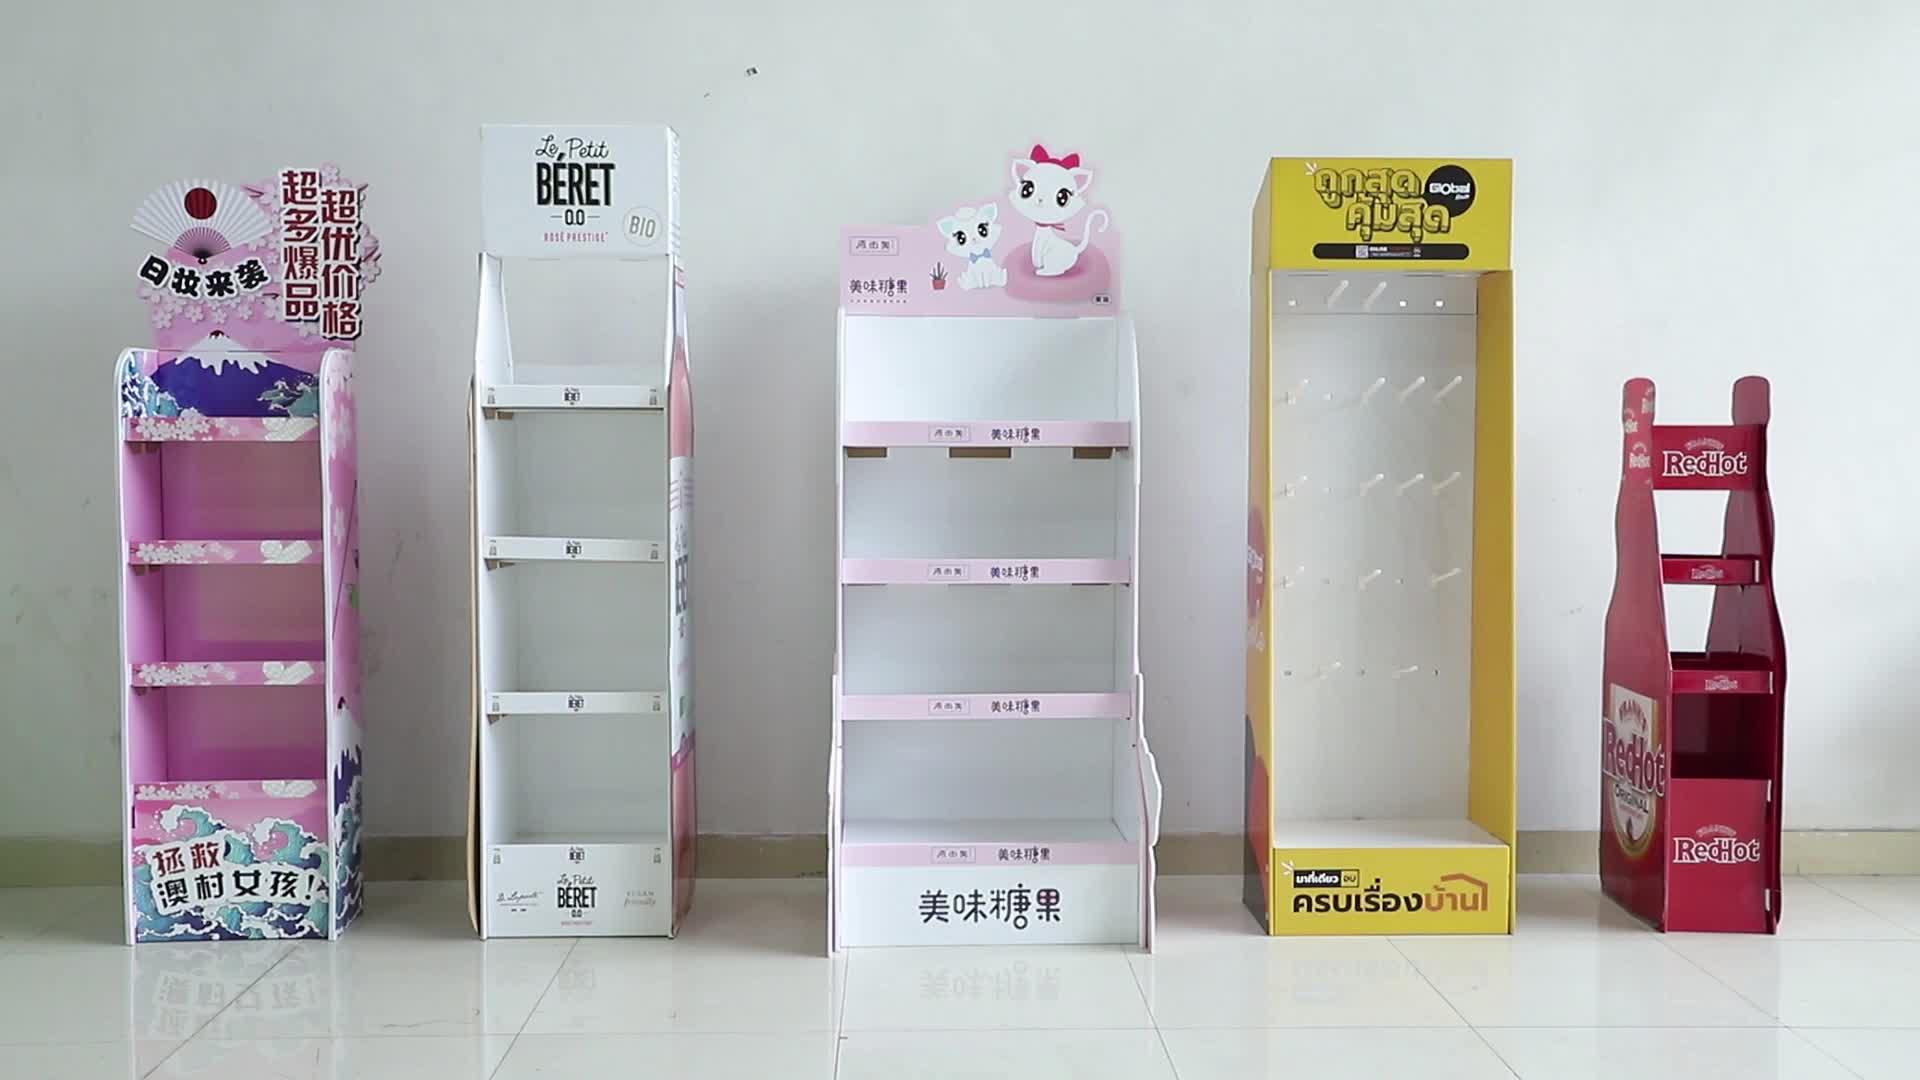 LED אור דוכן תצוגת קרטון, עמיד למים קידום נייר תצוגת Stand עם תאריך רצועת מחיר, אלקטרוני נייר מדף תצוגה